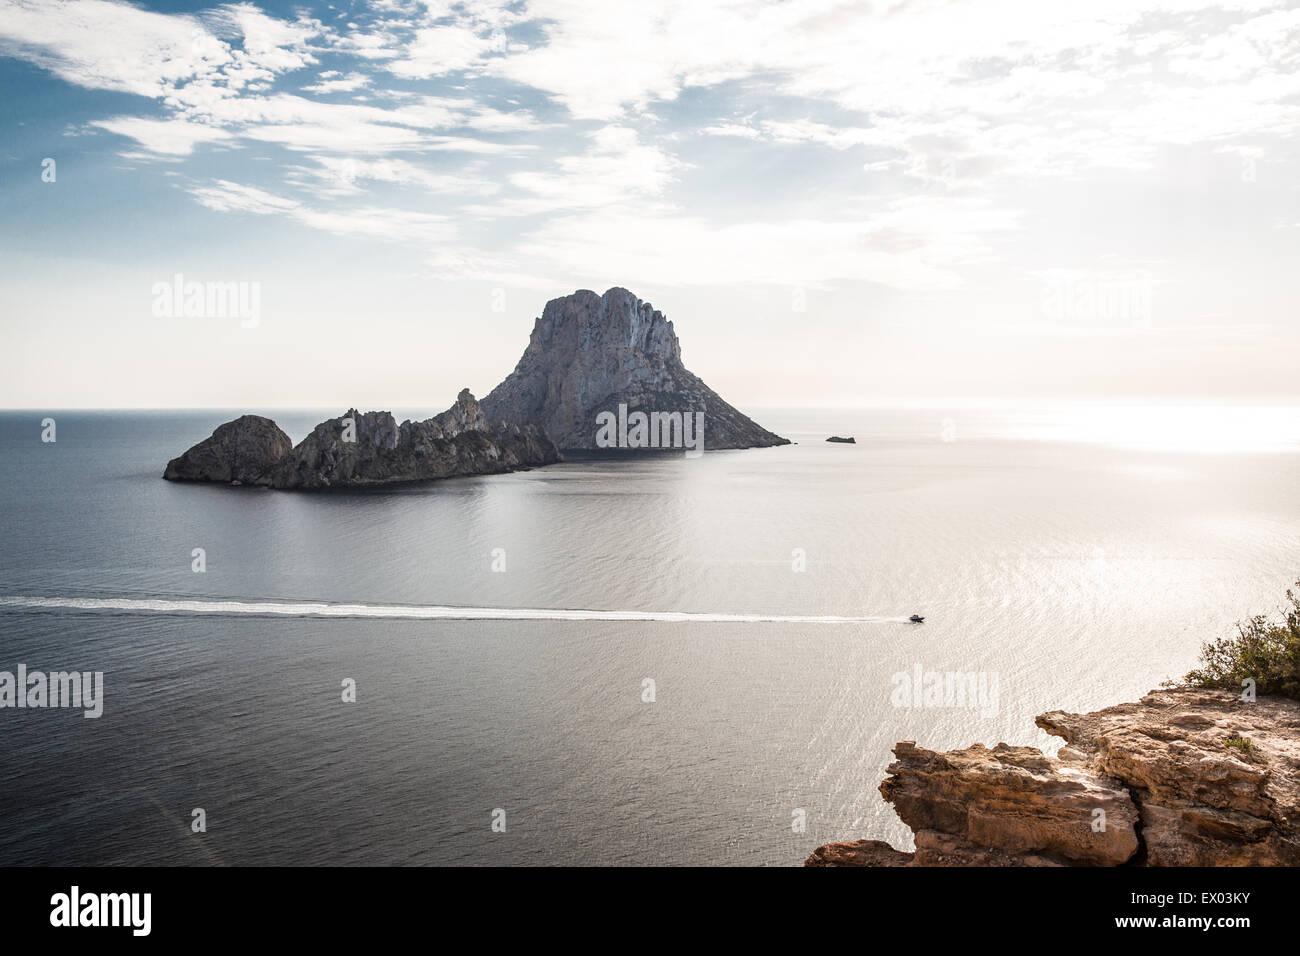 View of El Vedra island, Ibiza, Spain - Stock Image